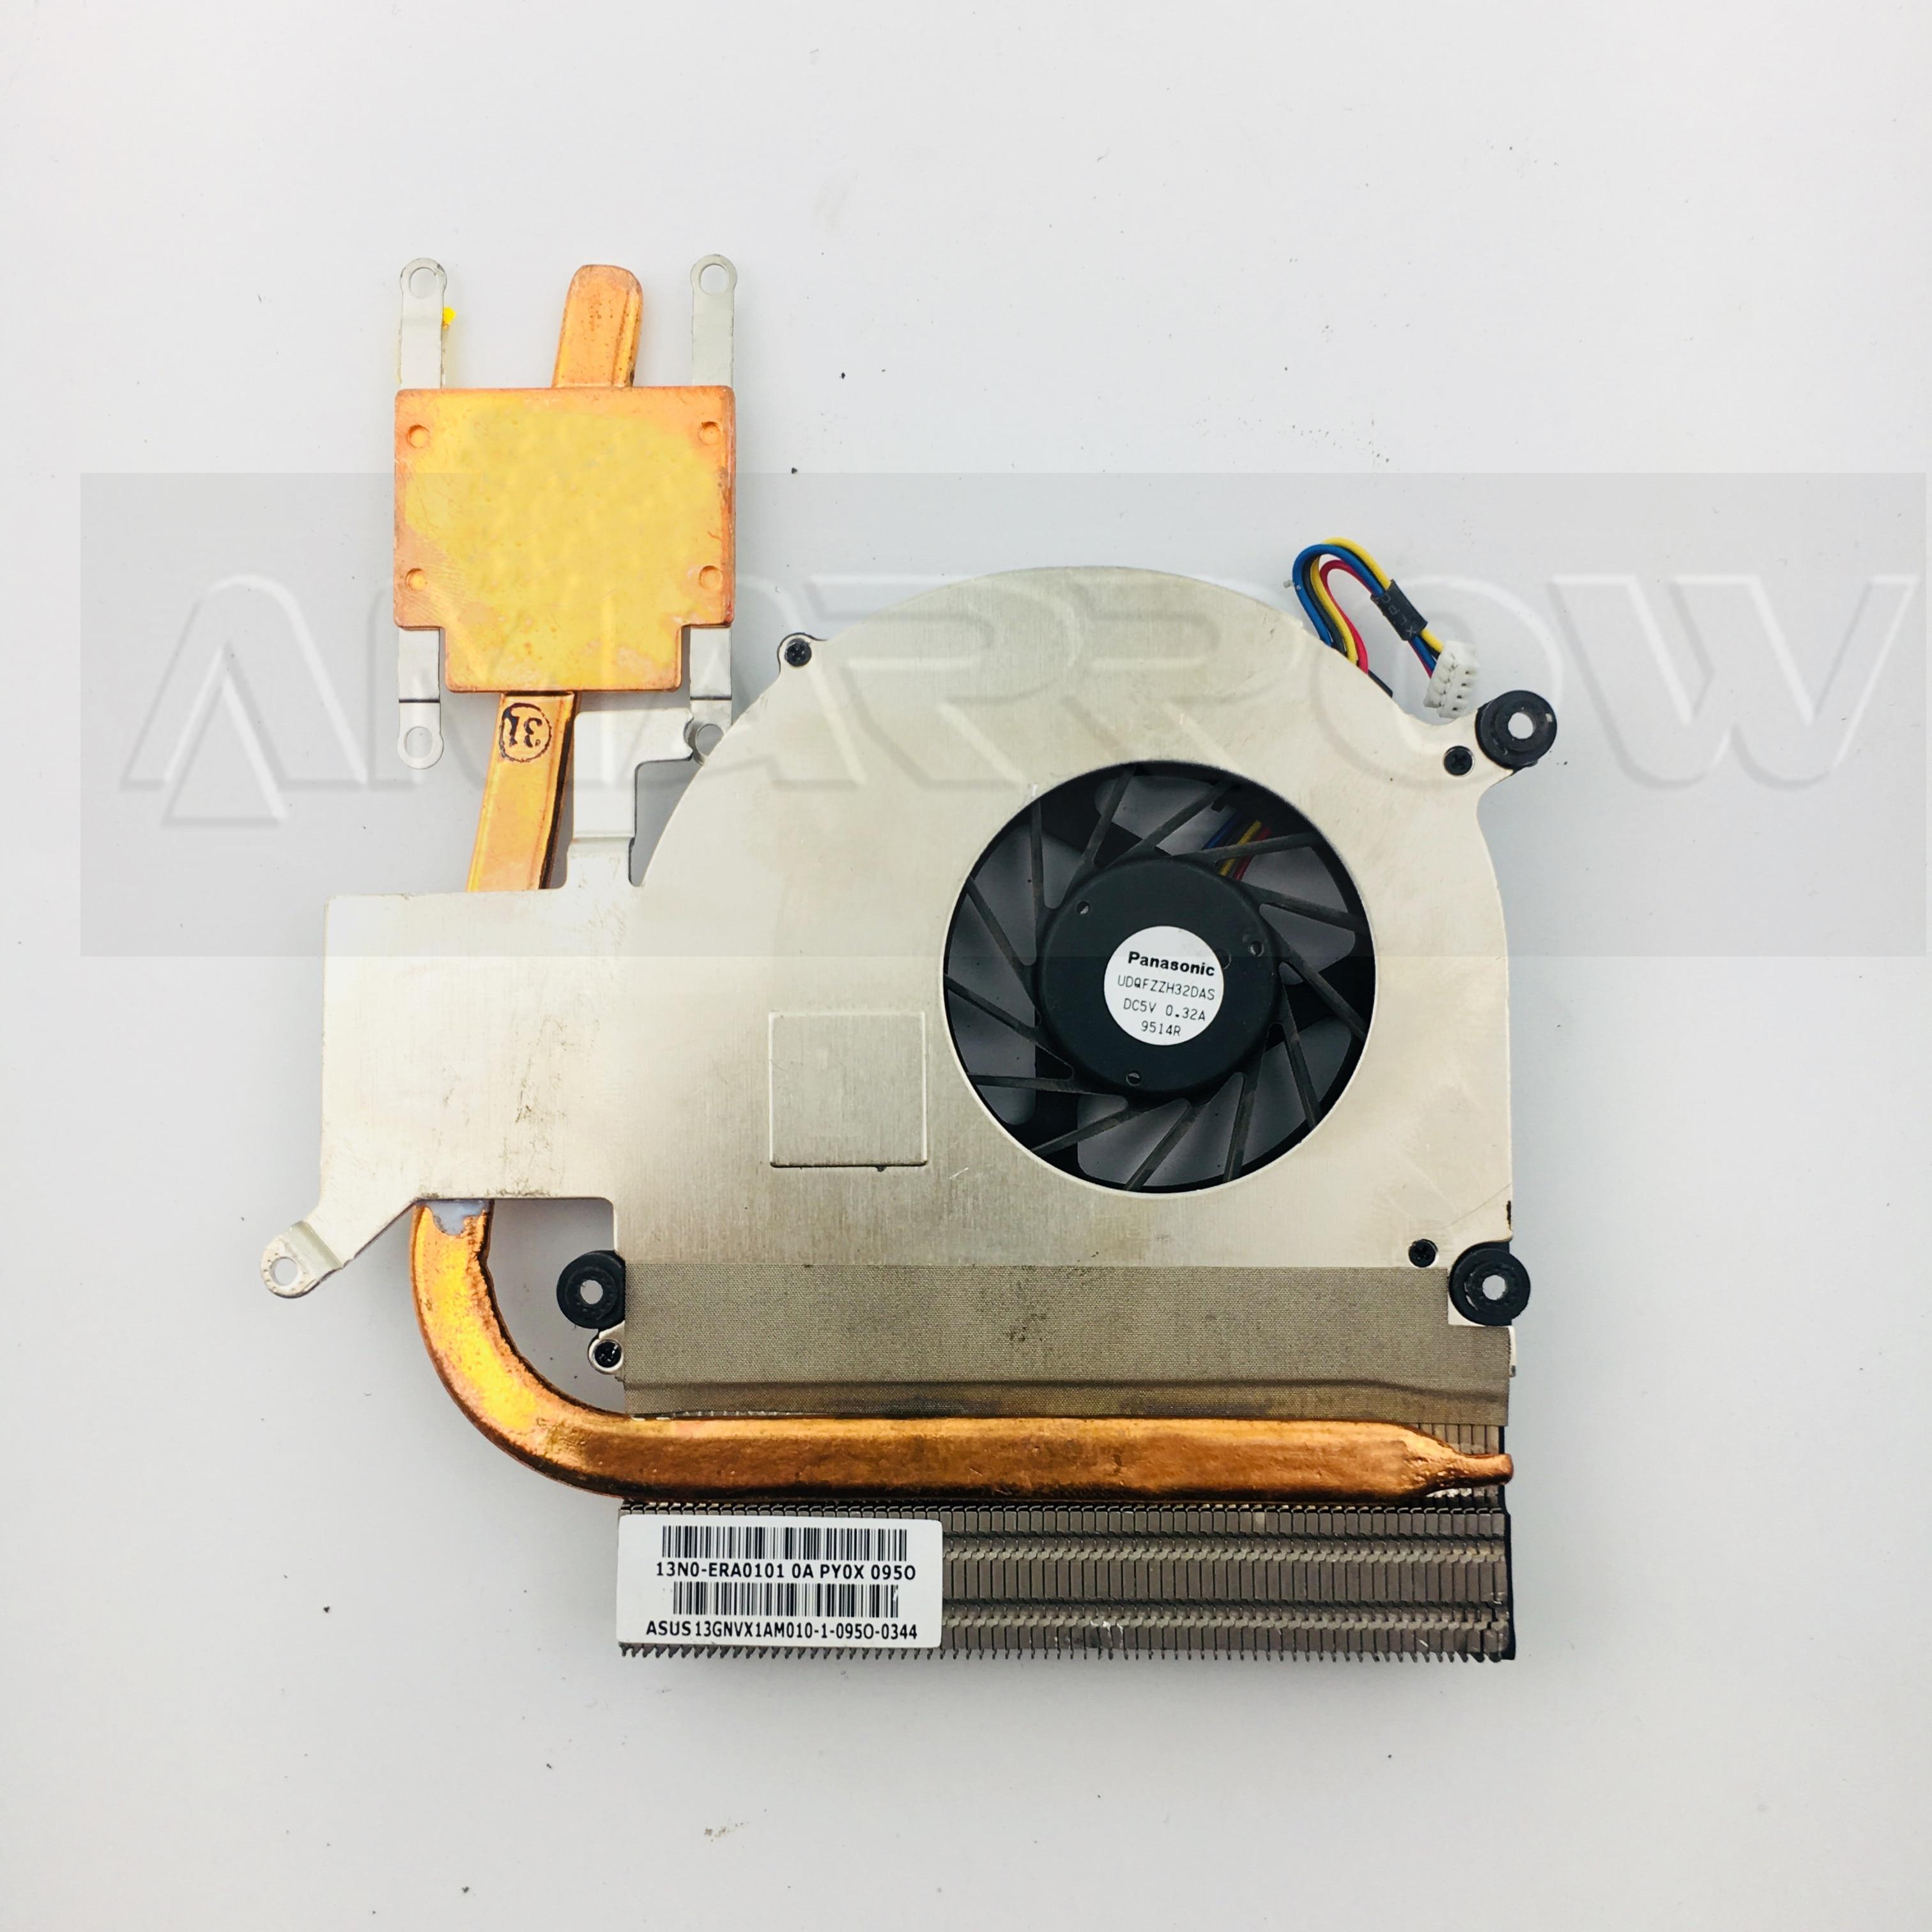 Original para asus laptop disipador ventilador de refrigeración de K40 K50 K40IJ K50IJ K50AB X8AAf K50AF K40IN K50IN K50IP K50ID K50IE disipador CPU